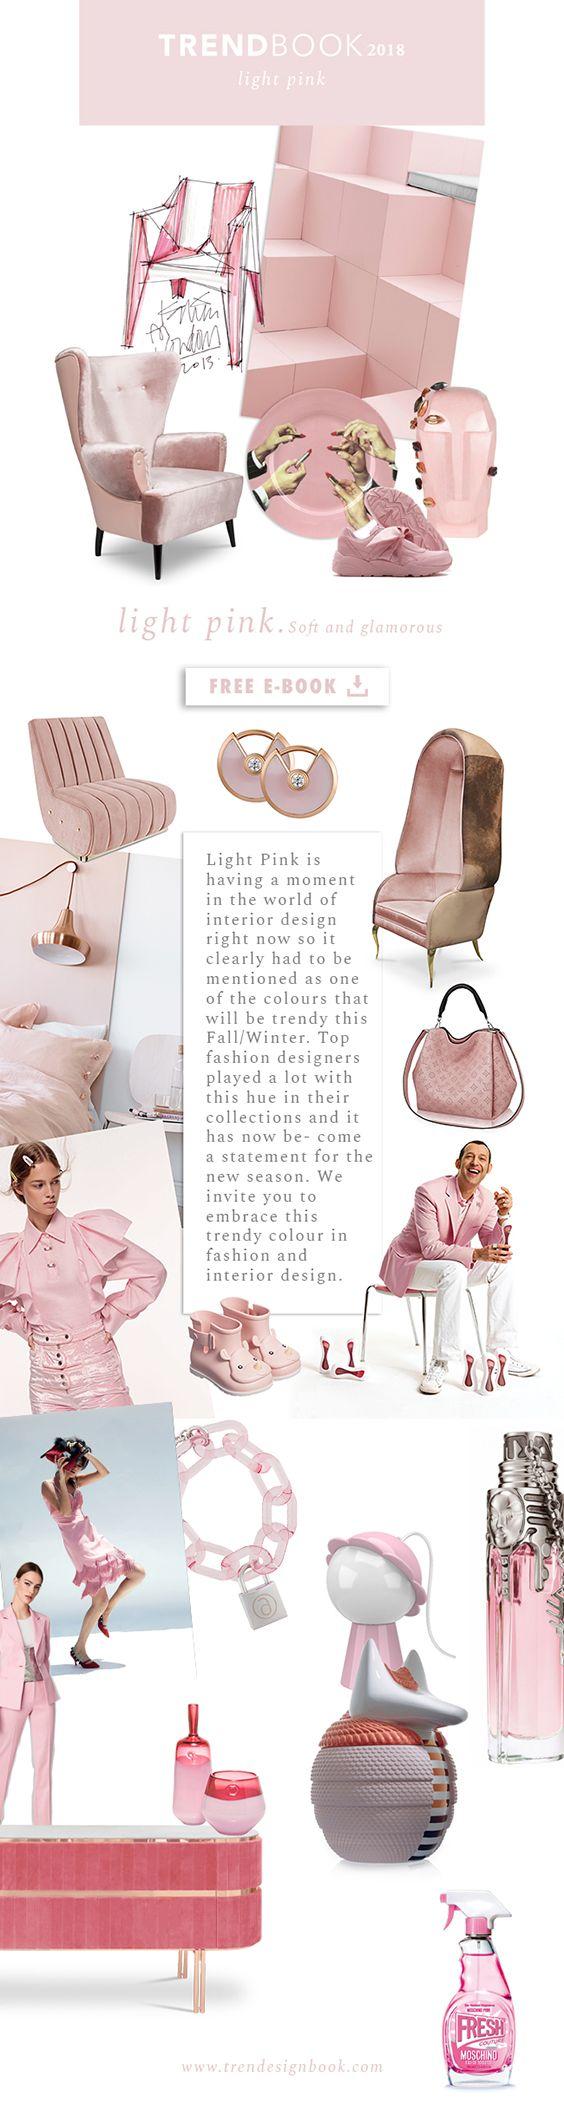 Moodboard Color Trends 2018 Light Pink